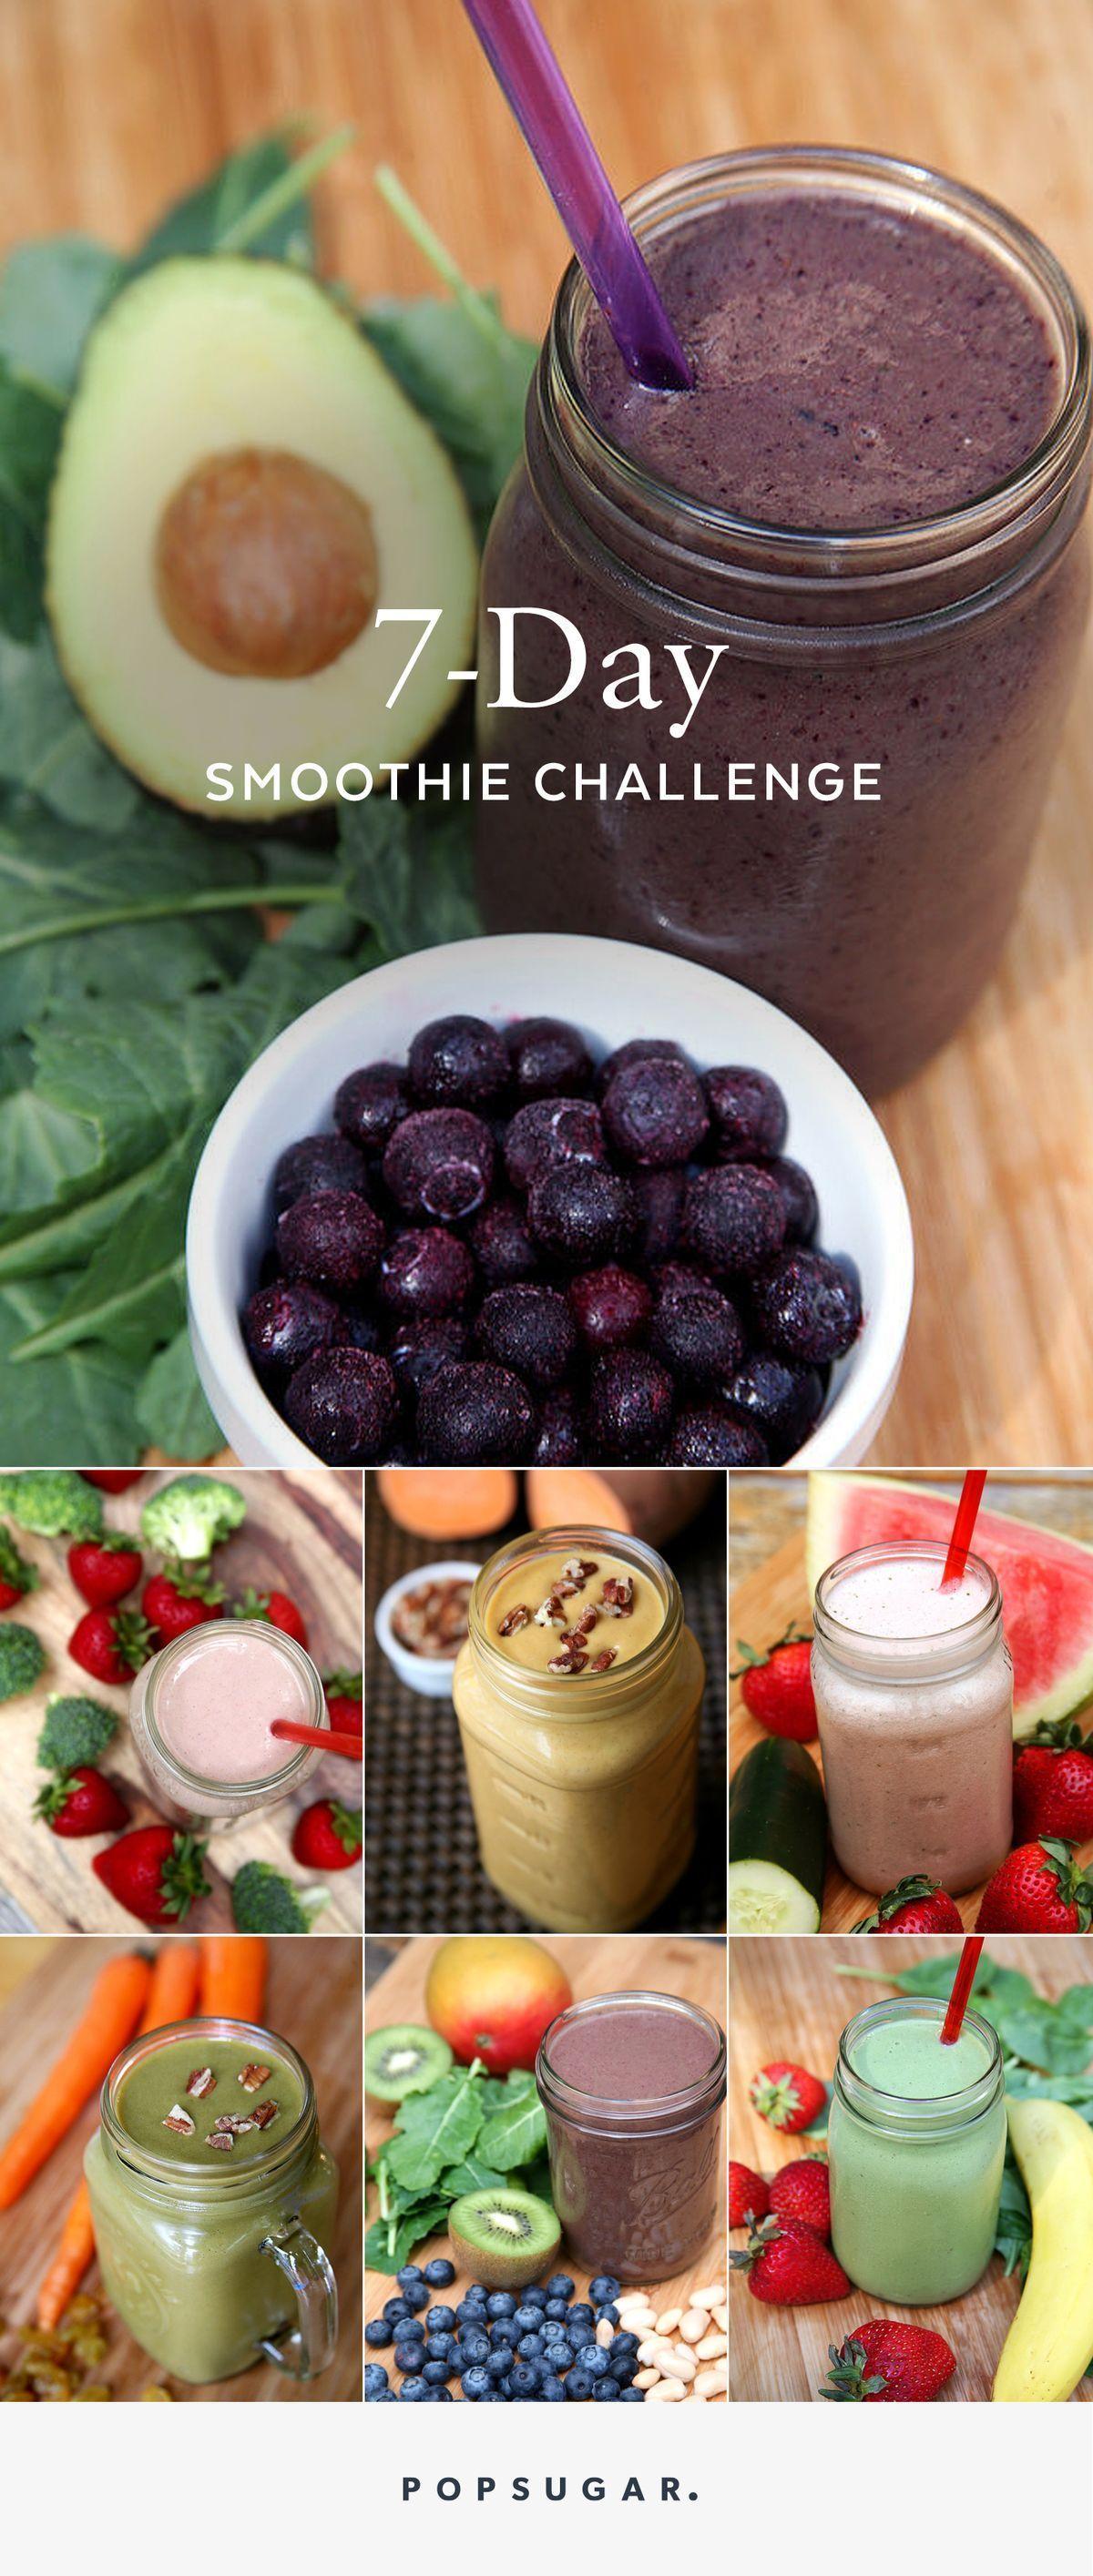 7-Day Breakfast Smoothie Challenge advise